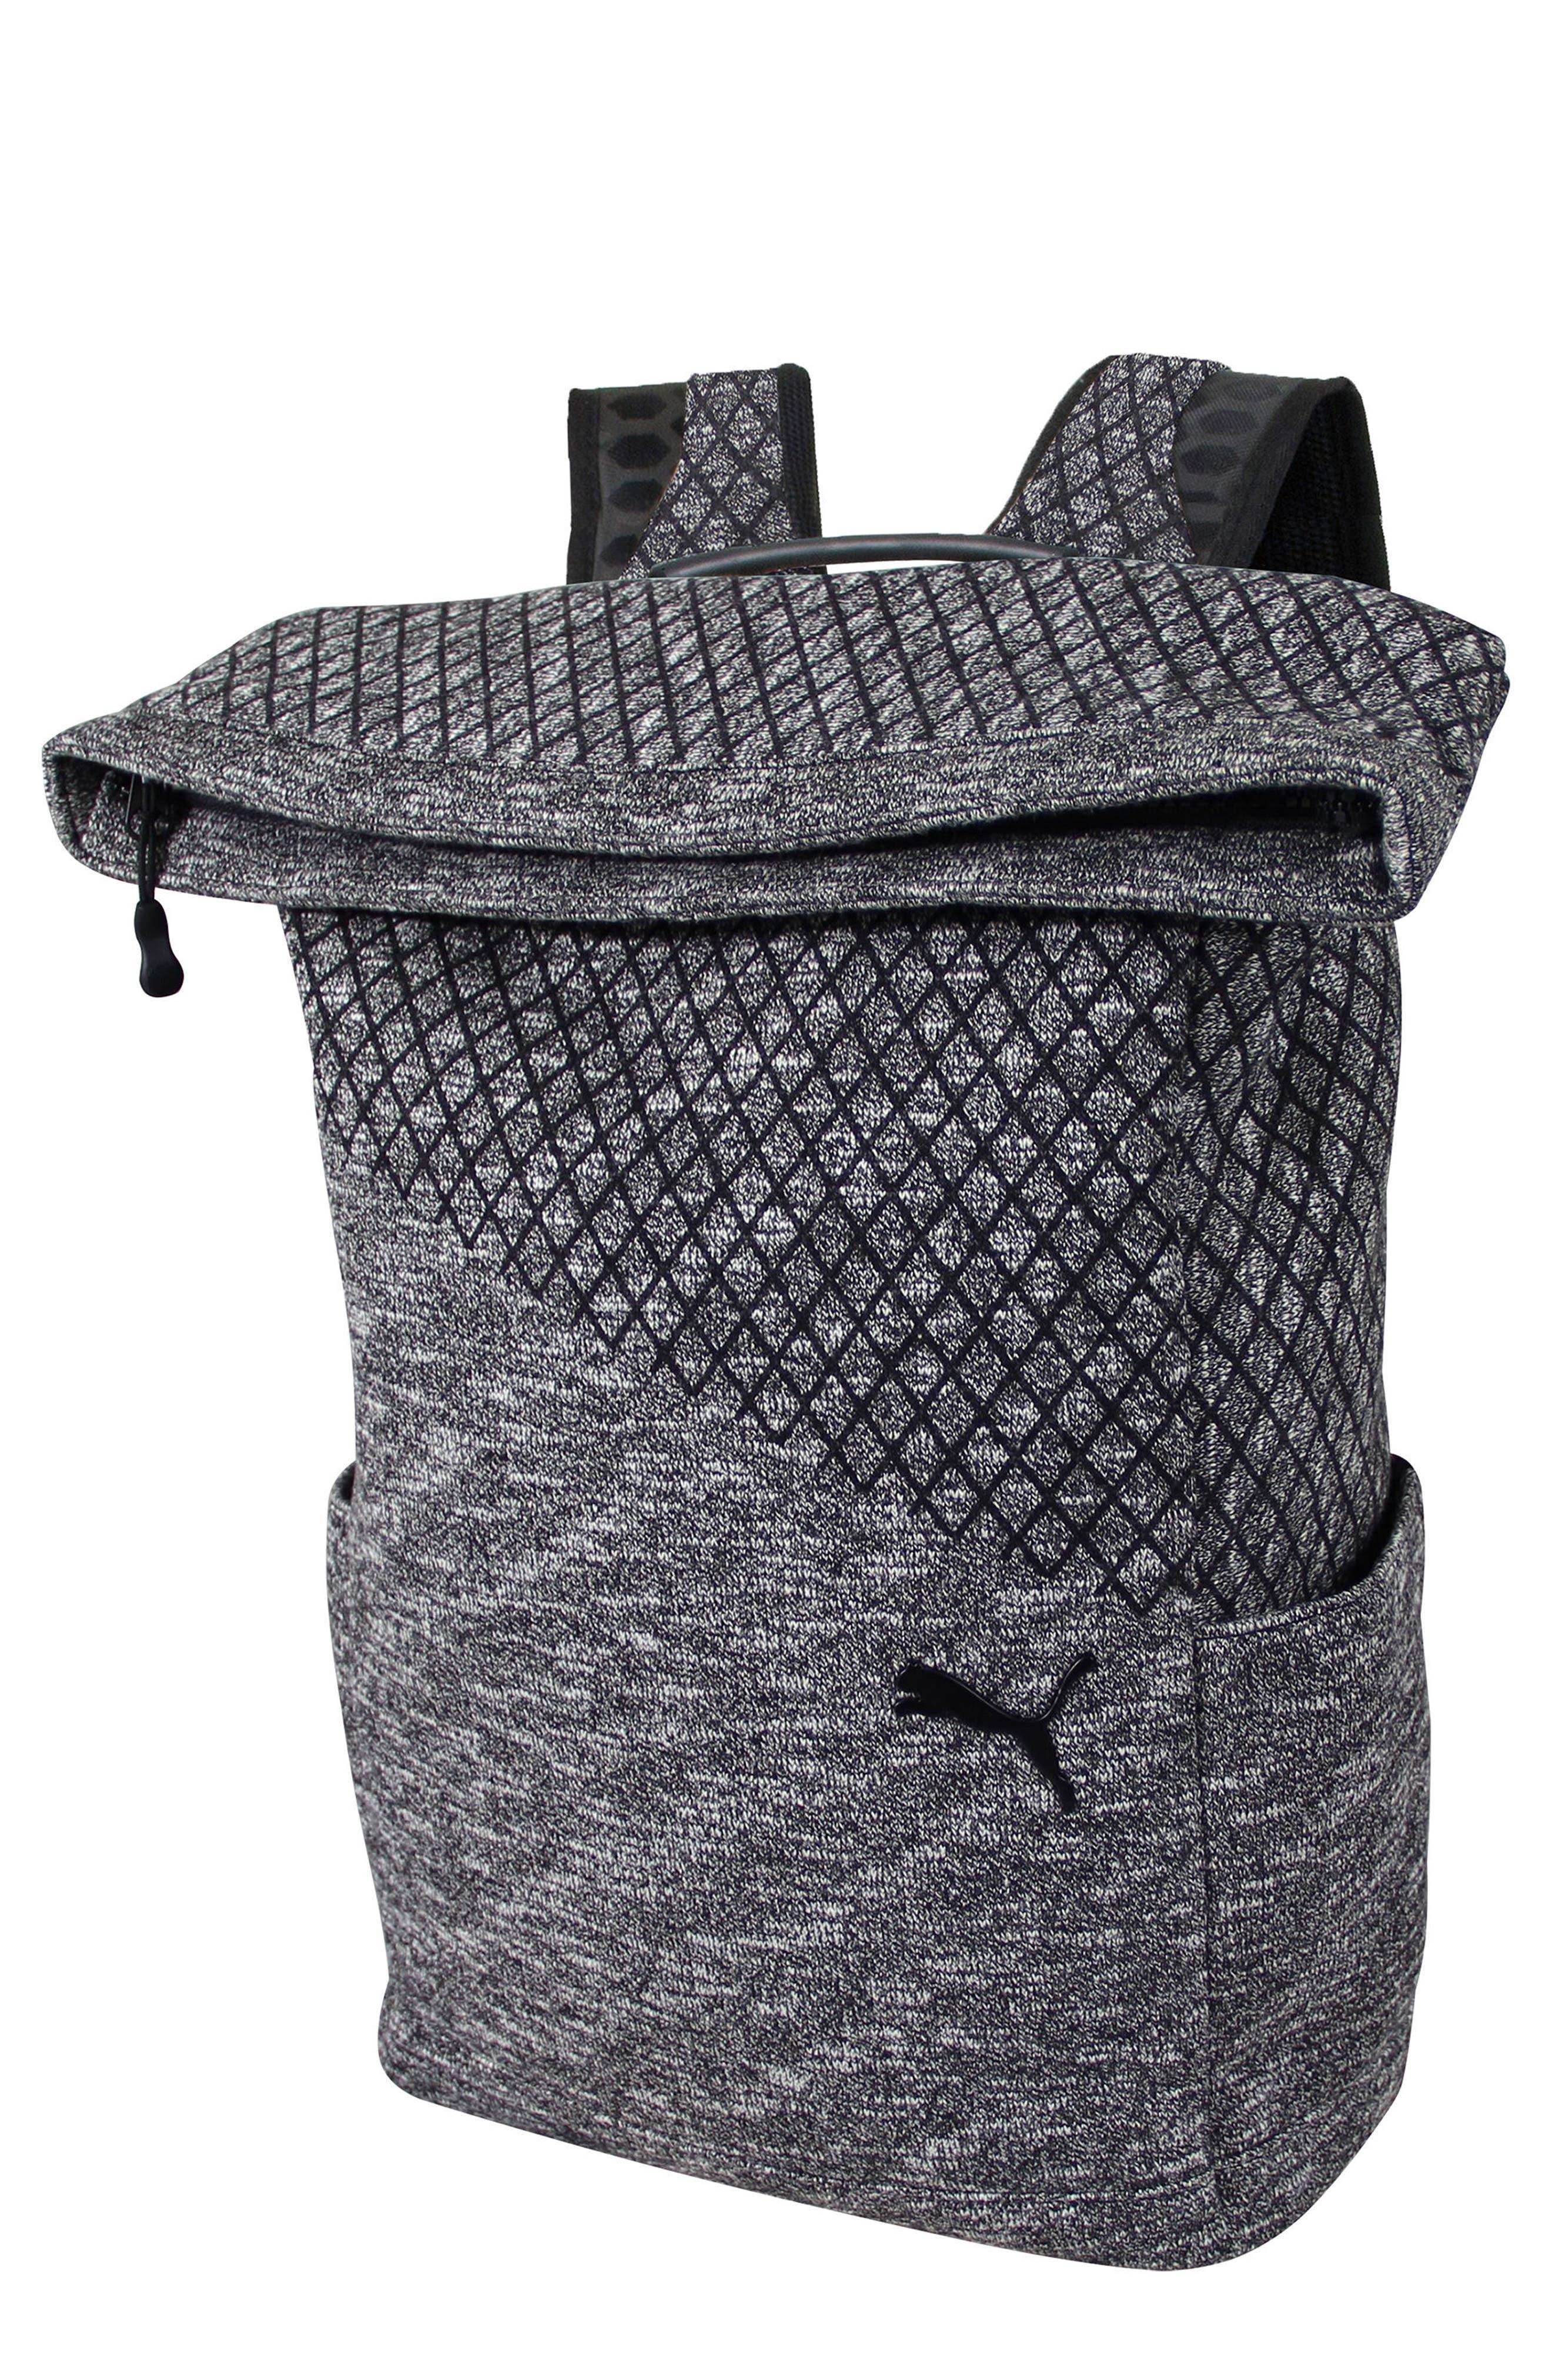 Evo 2.0 Foldover Top Knit Backpack,                         Main,                         color, BLACK/ GREY